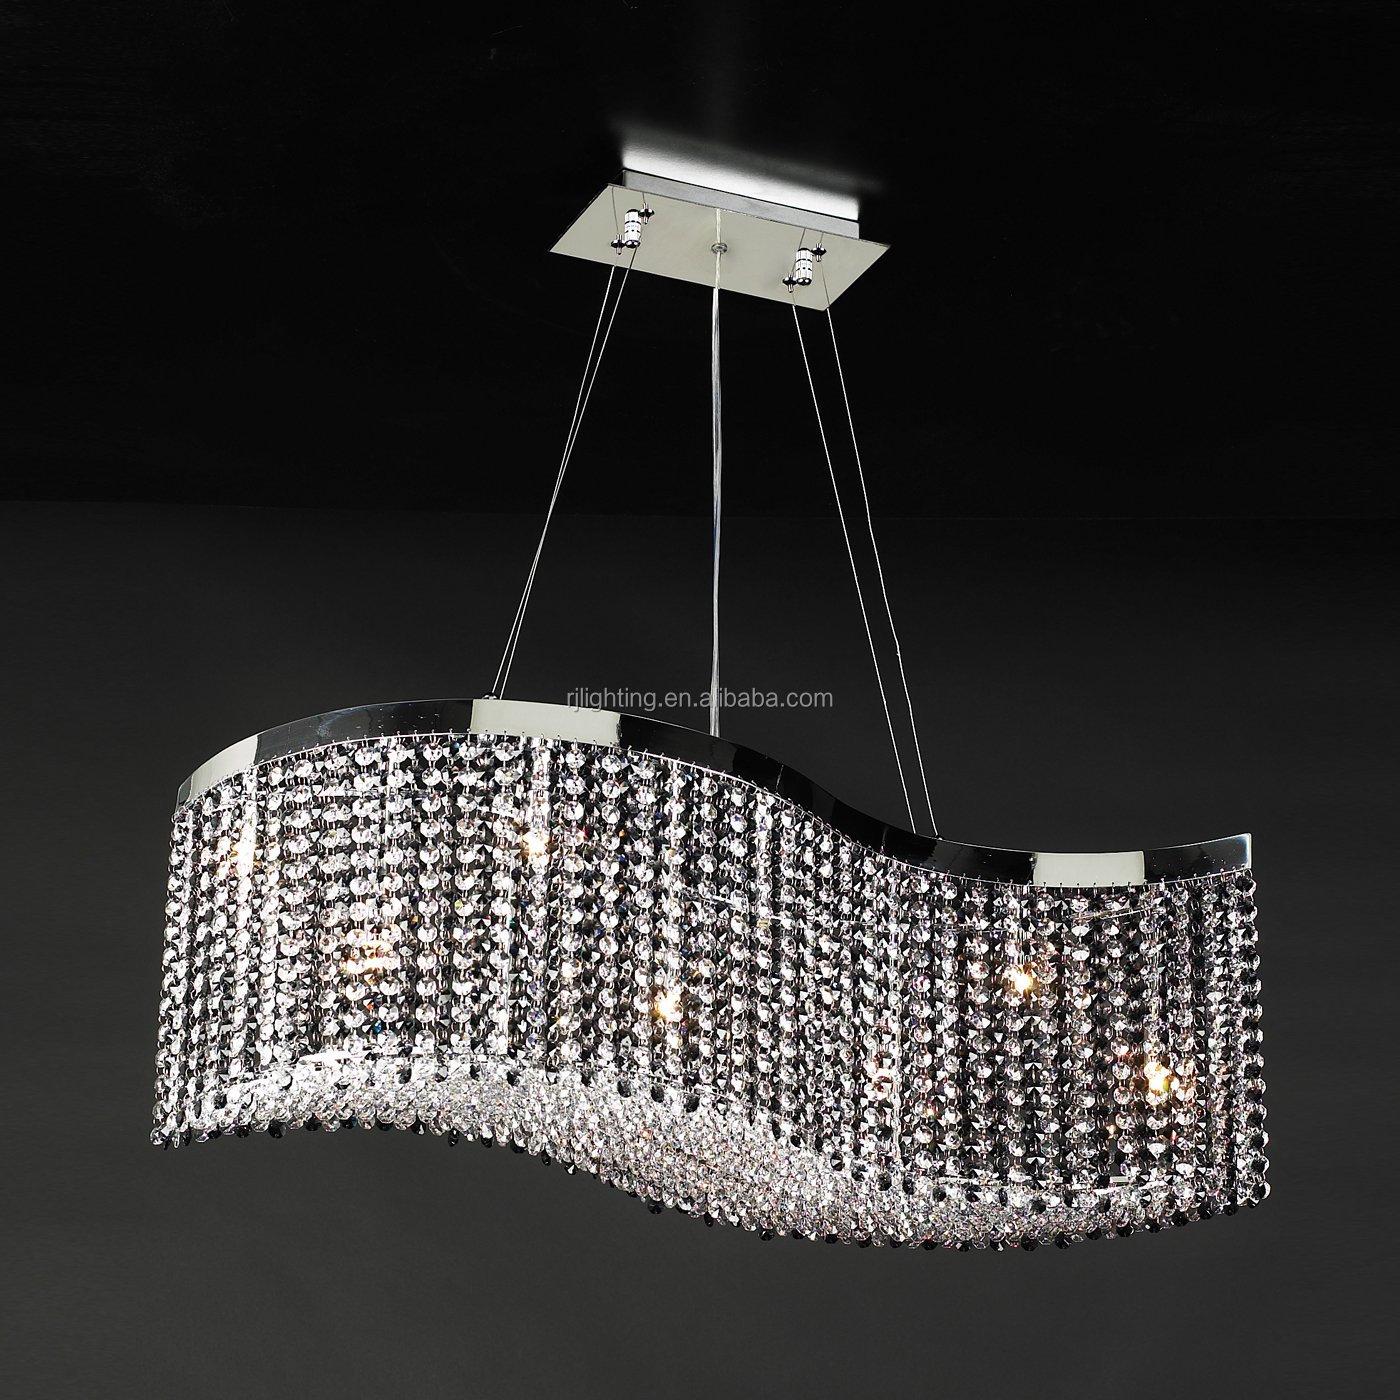 K9 Crystal Light Fixtures Dining Room Pendant Light Crystal Chain Led Modern S Shape Wave Lamp Buy Wave Lamp Crystal Modern Pendant Lamp Light Fixture Product On Alibaba Com